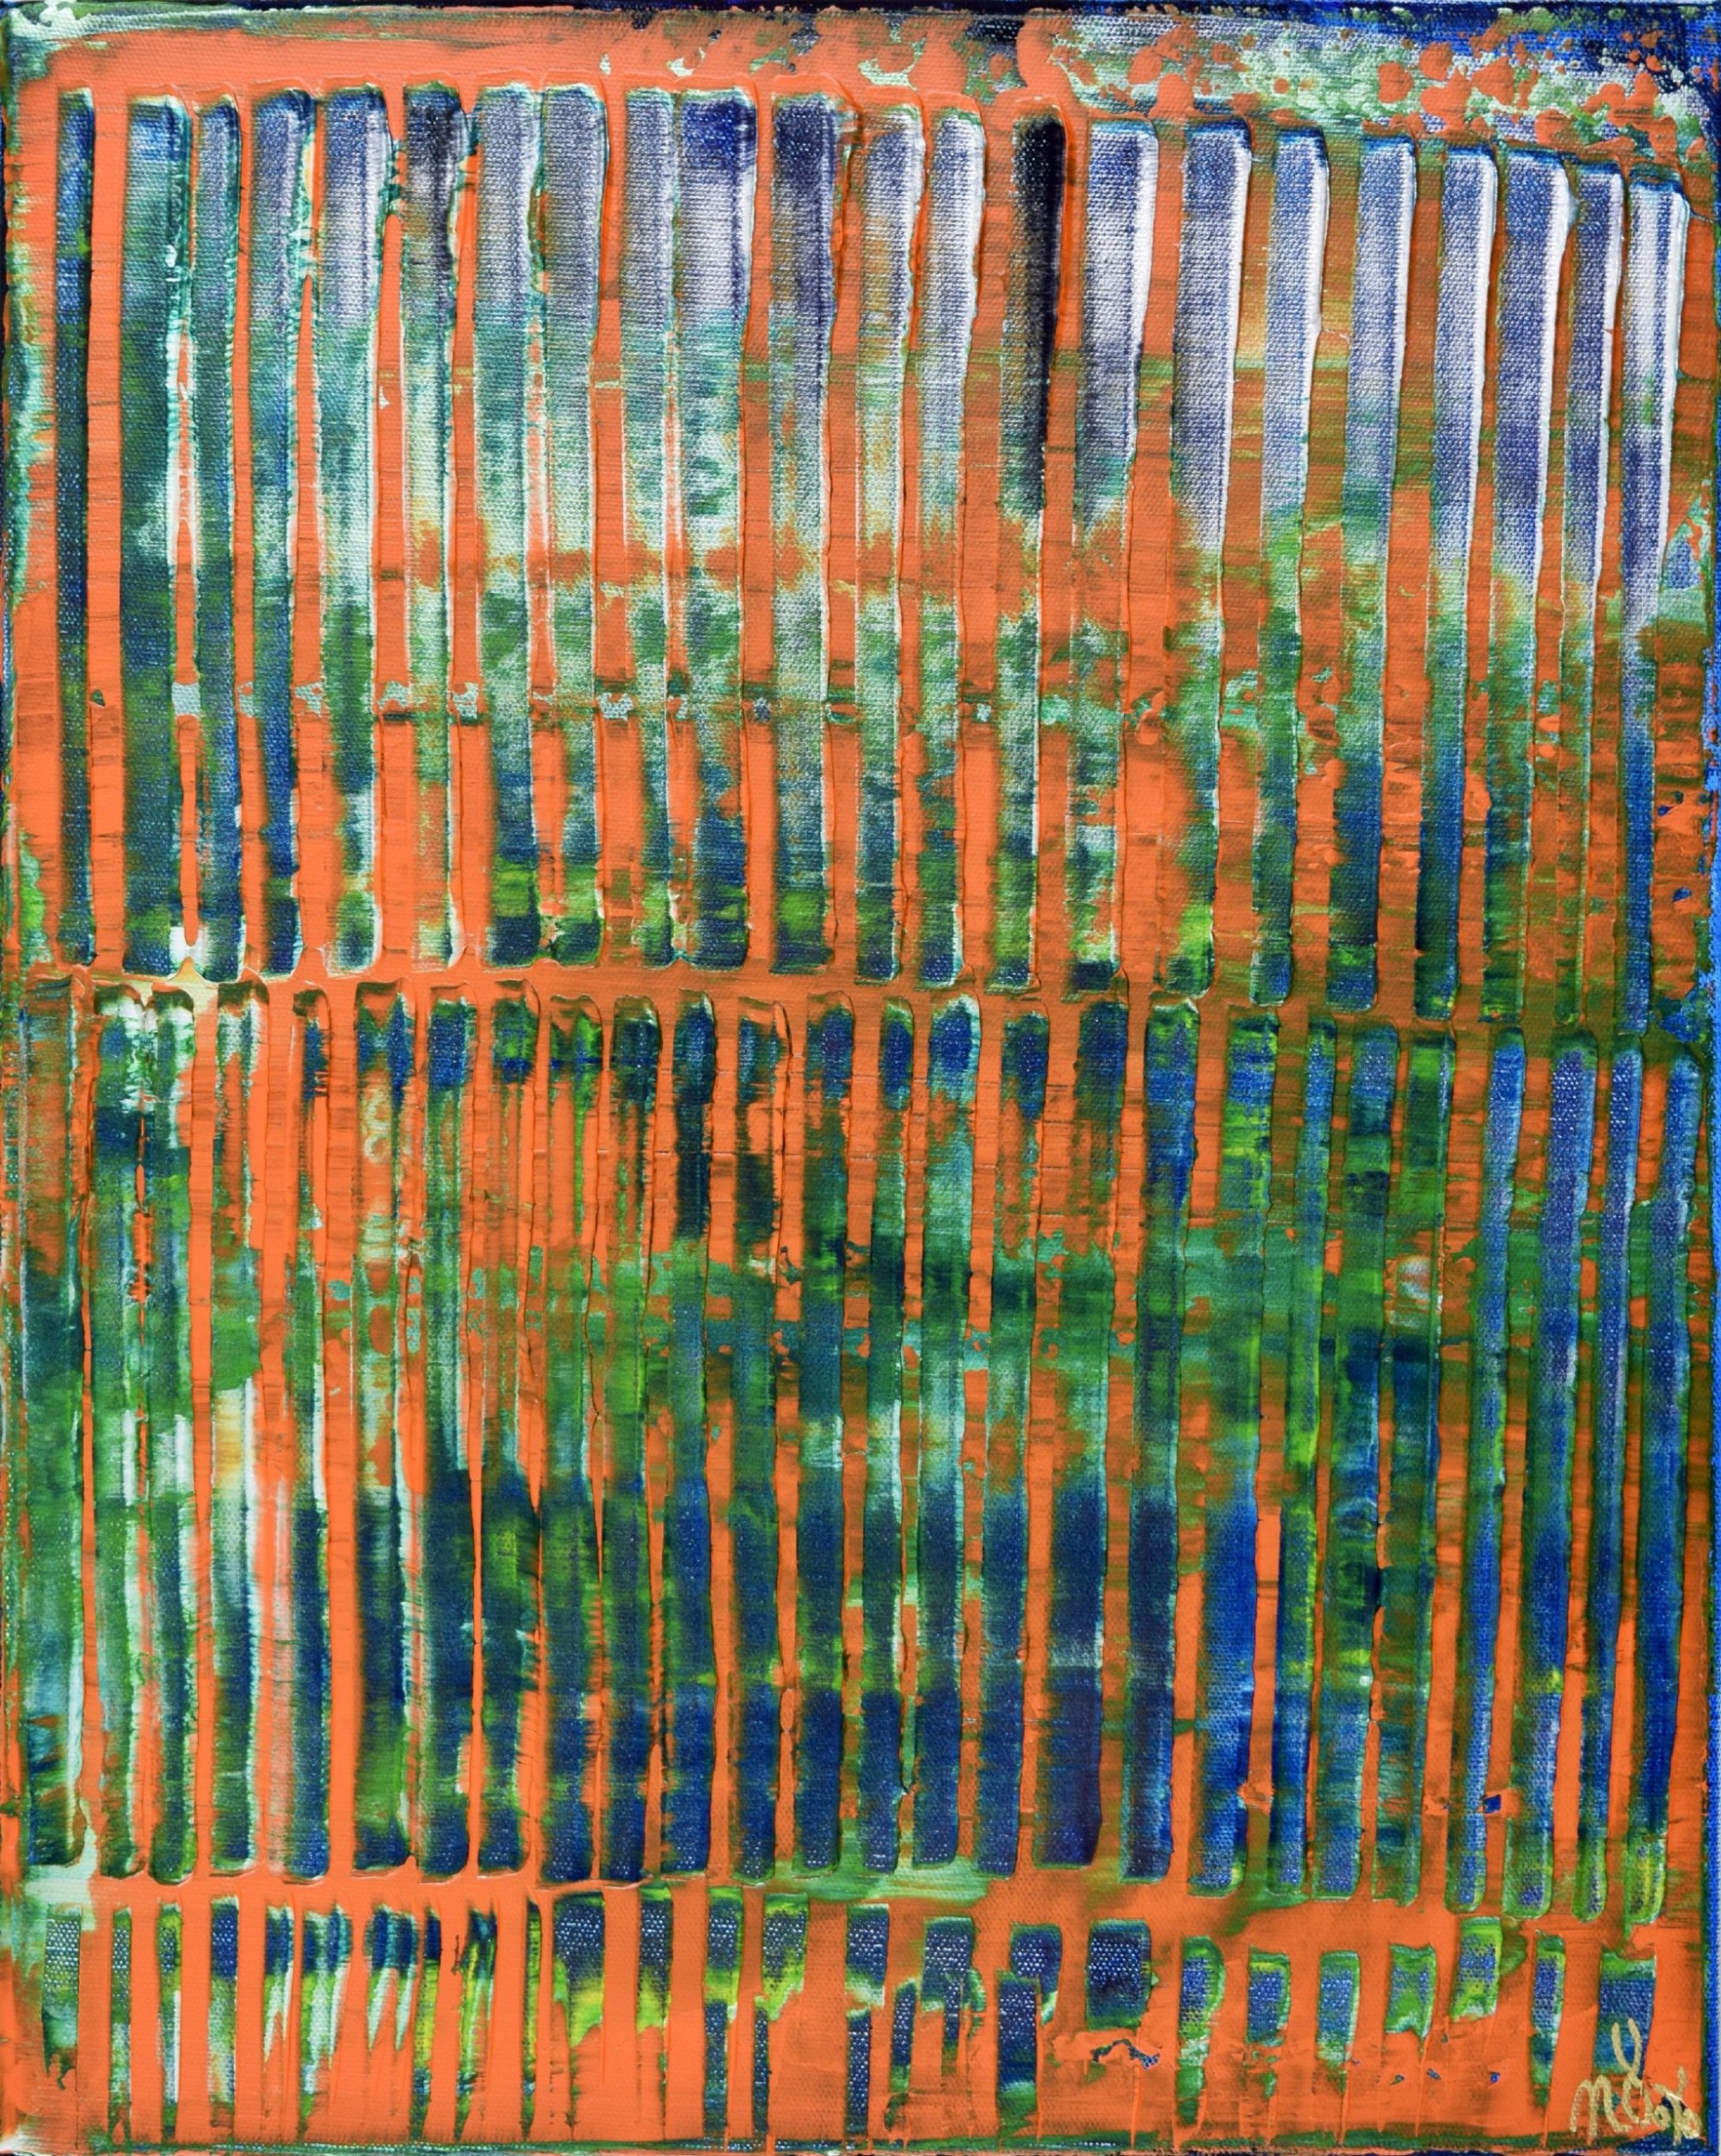 Full Canvas - Orange Panorama (Blue Reflections) (2020) by Nestor Toro